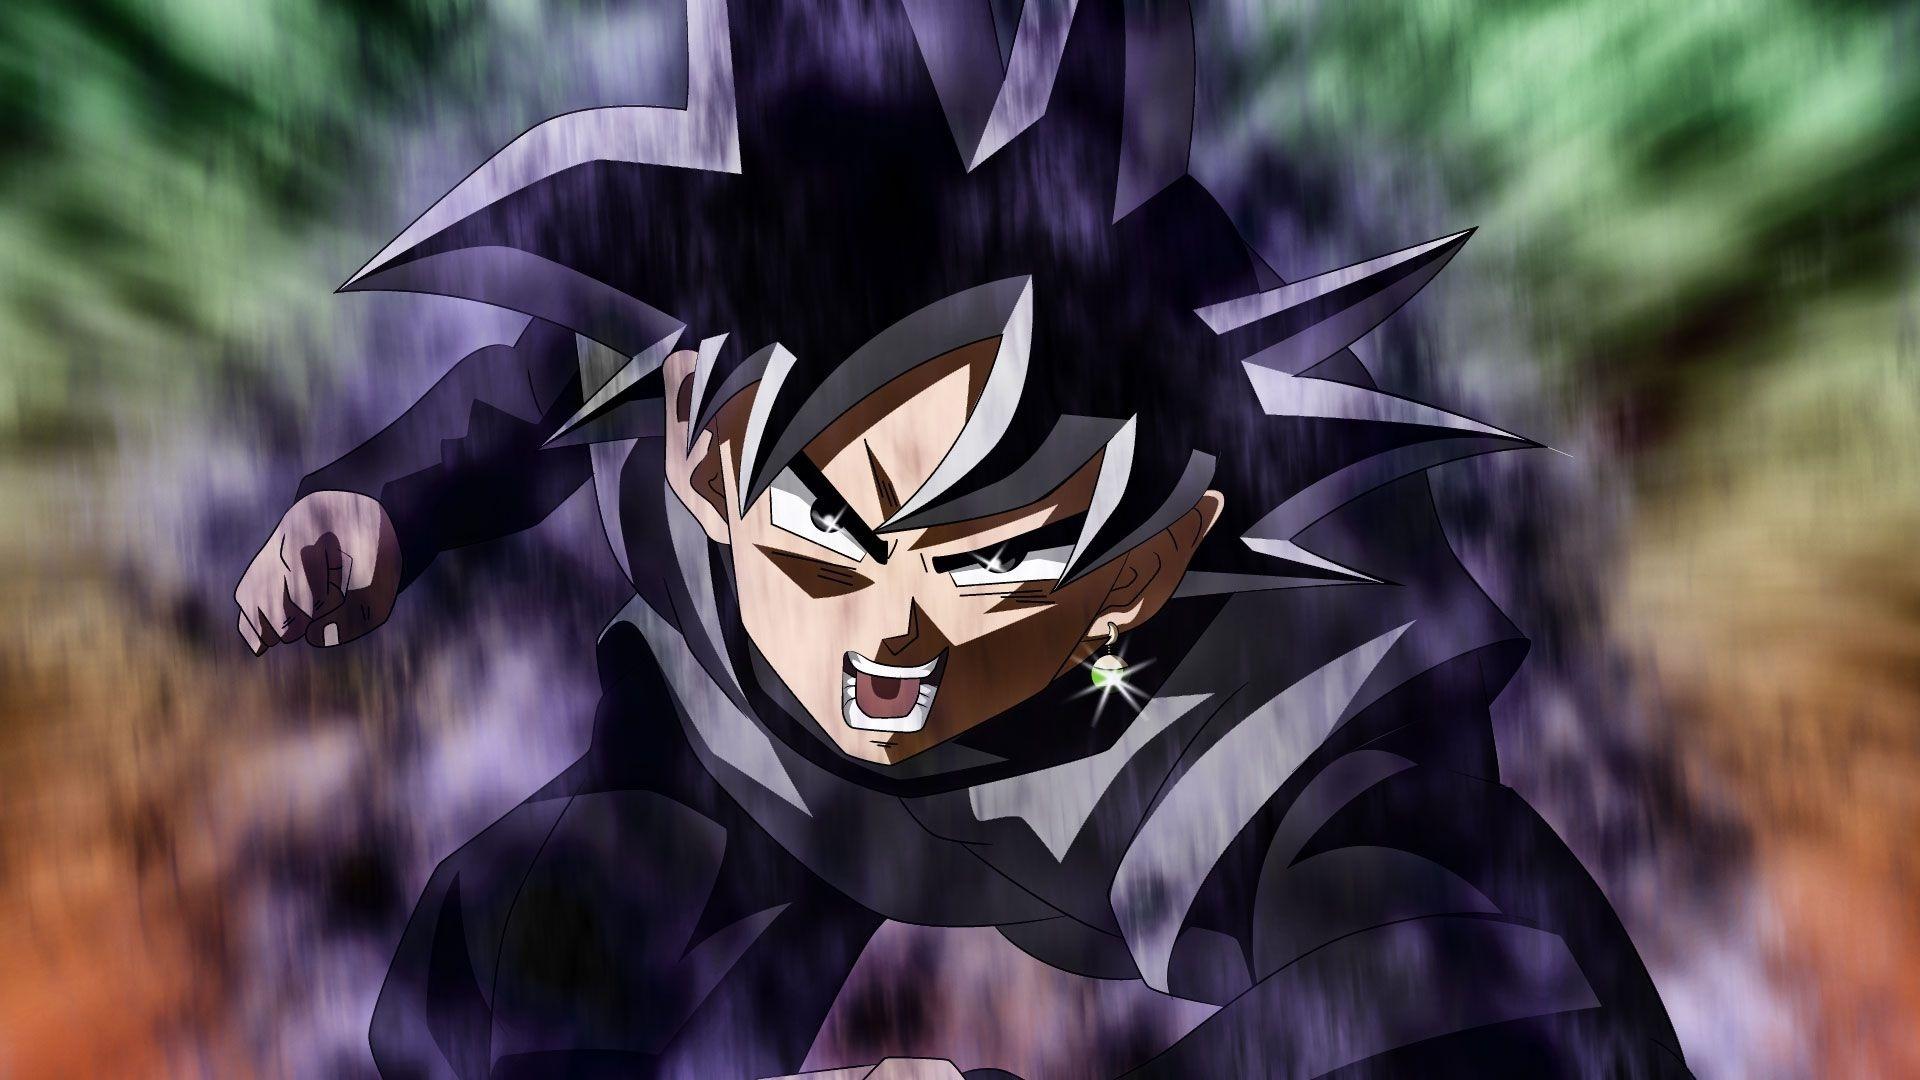 Goku Black hd background